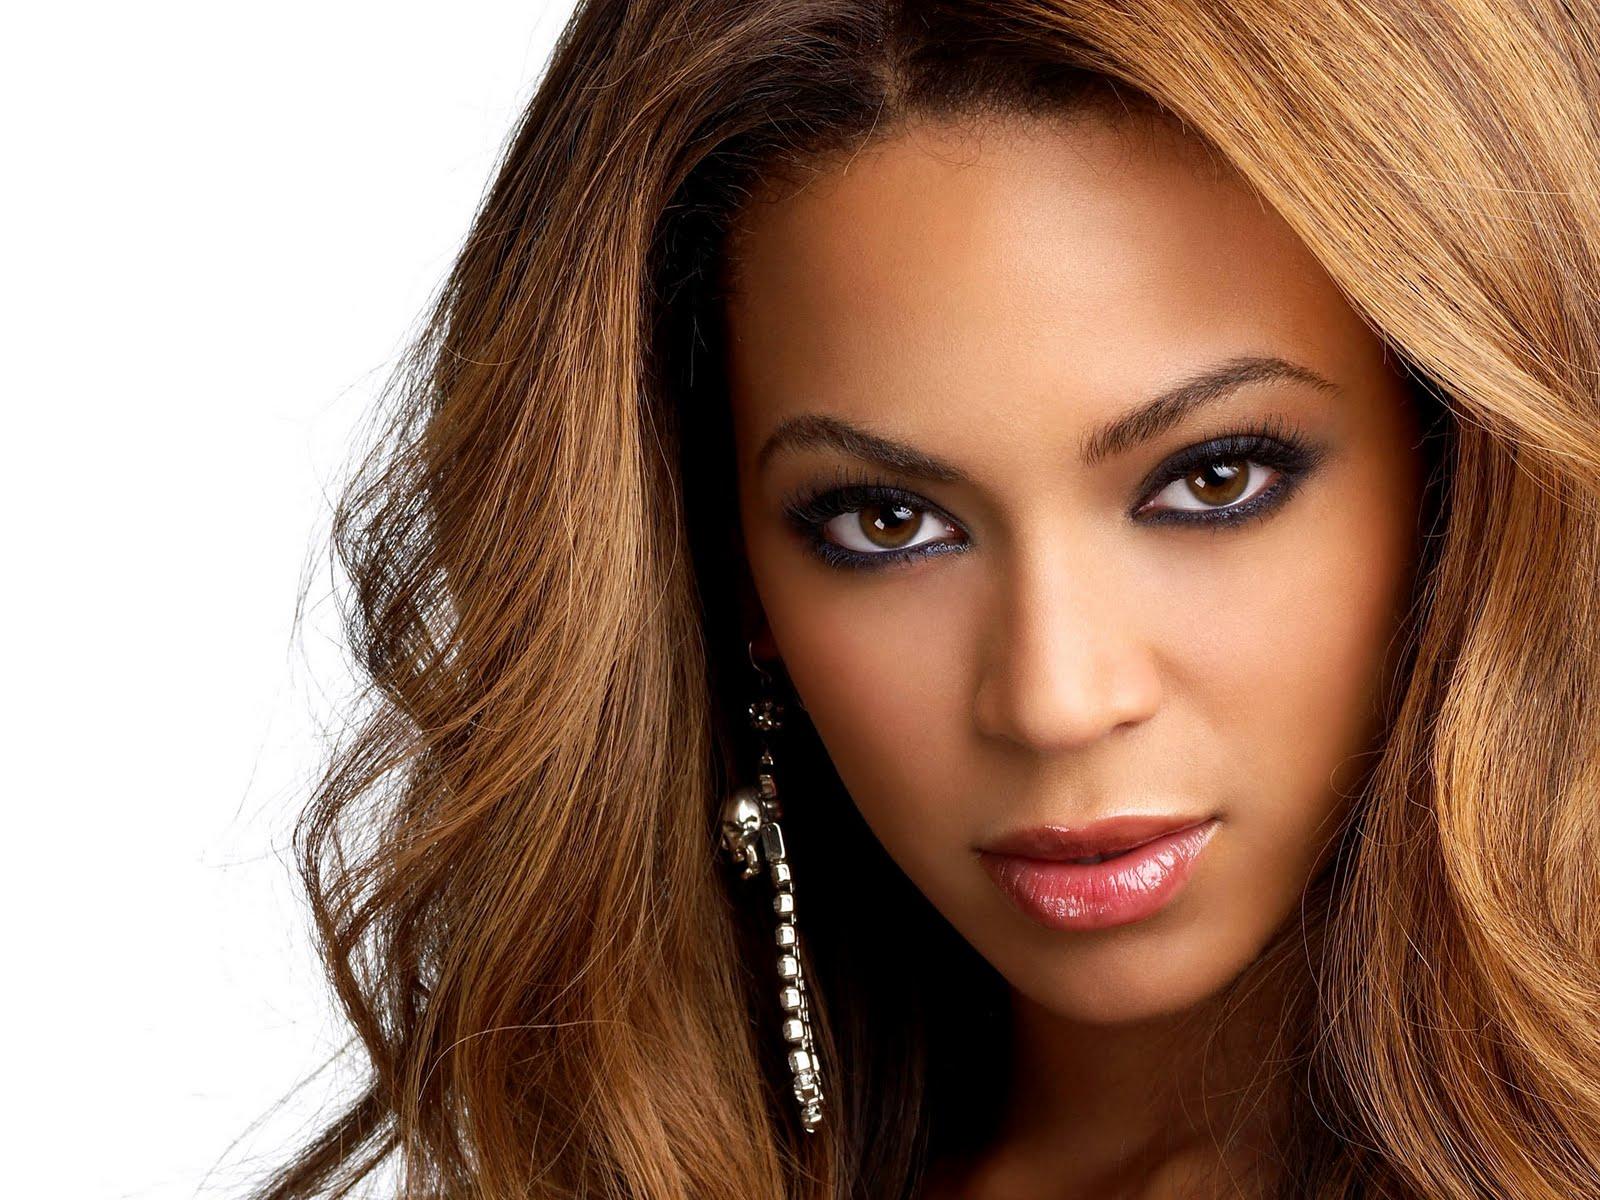 http://4.bp.blogspot.com/-CFULcuCxqqk/TpiKPoDrhKI/AAAAAAAAAXQ/MS4yHWB232s/s1600/Beyonce-Knowles-808.jpg